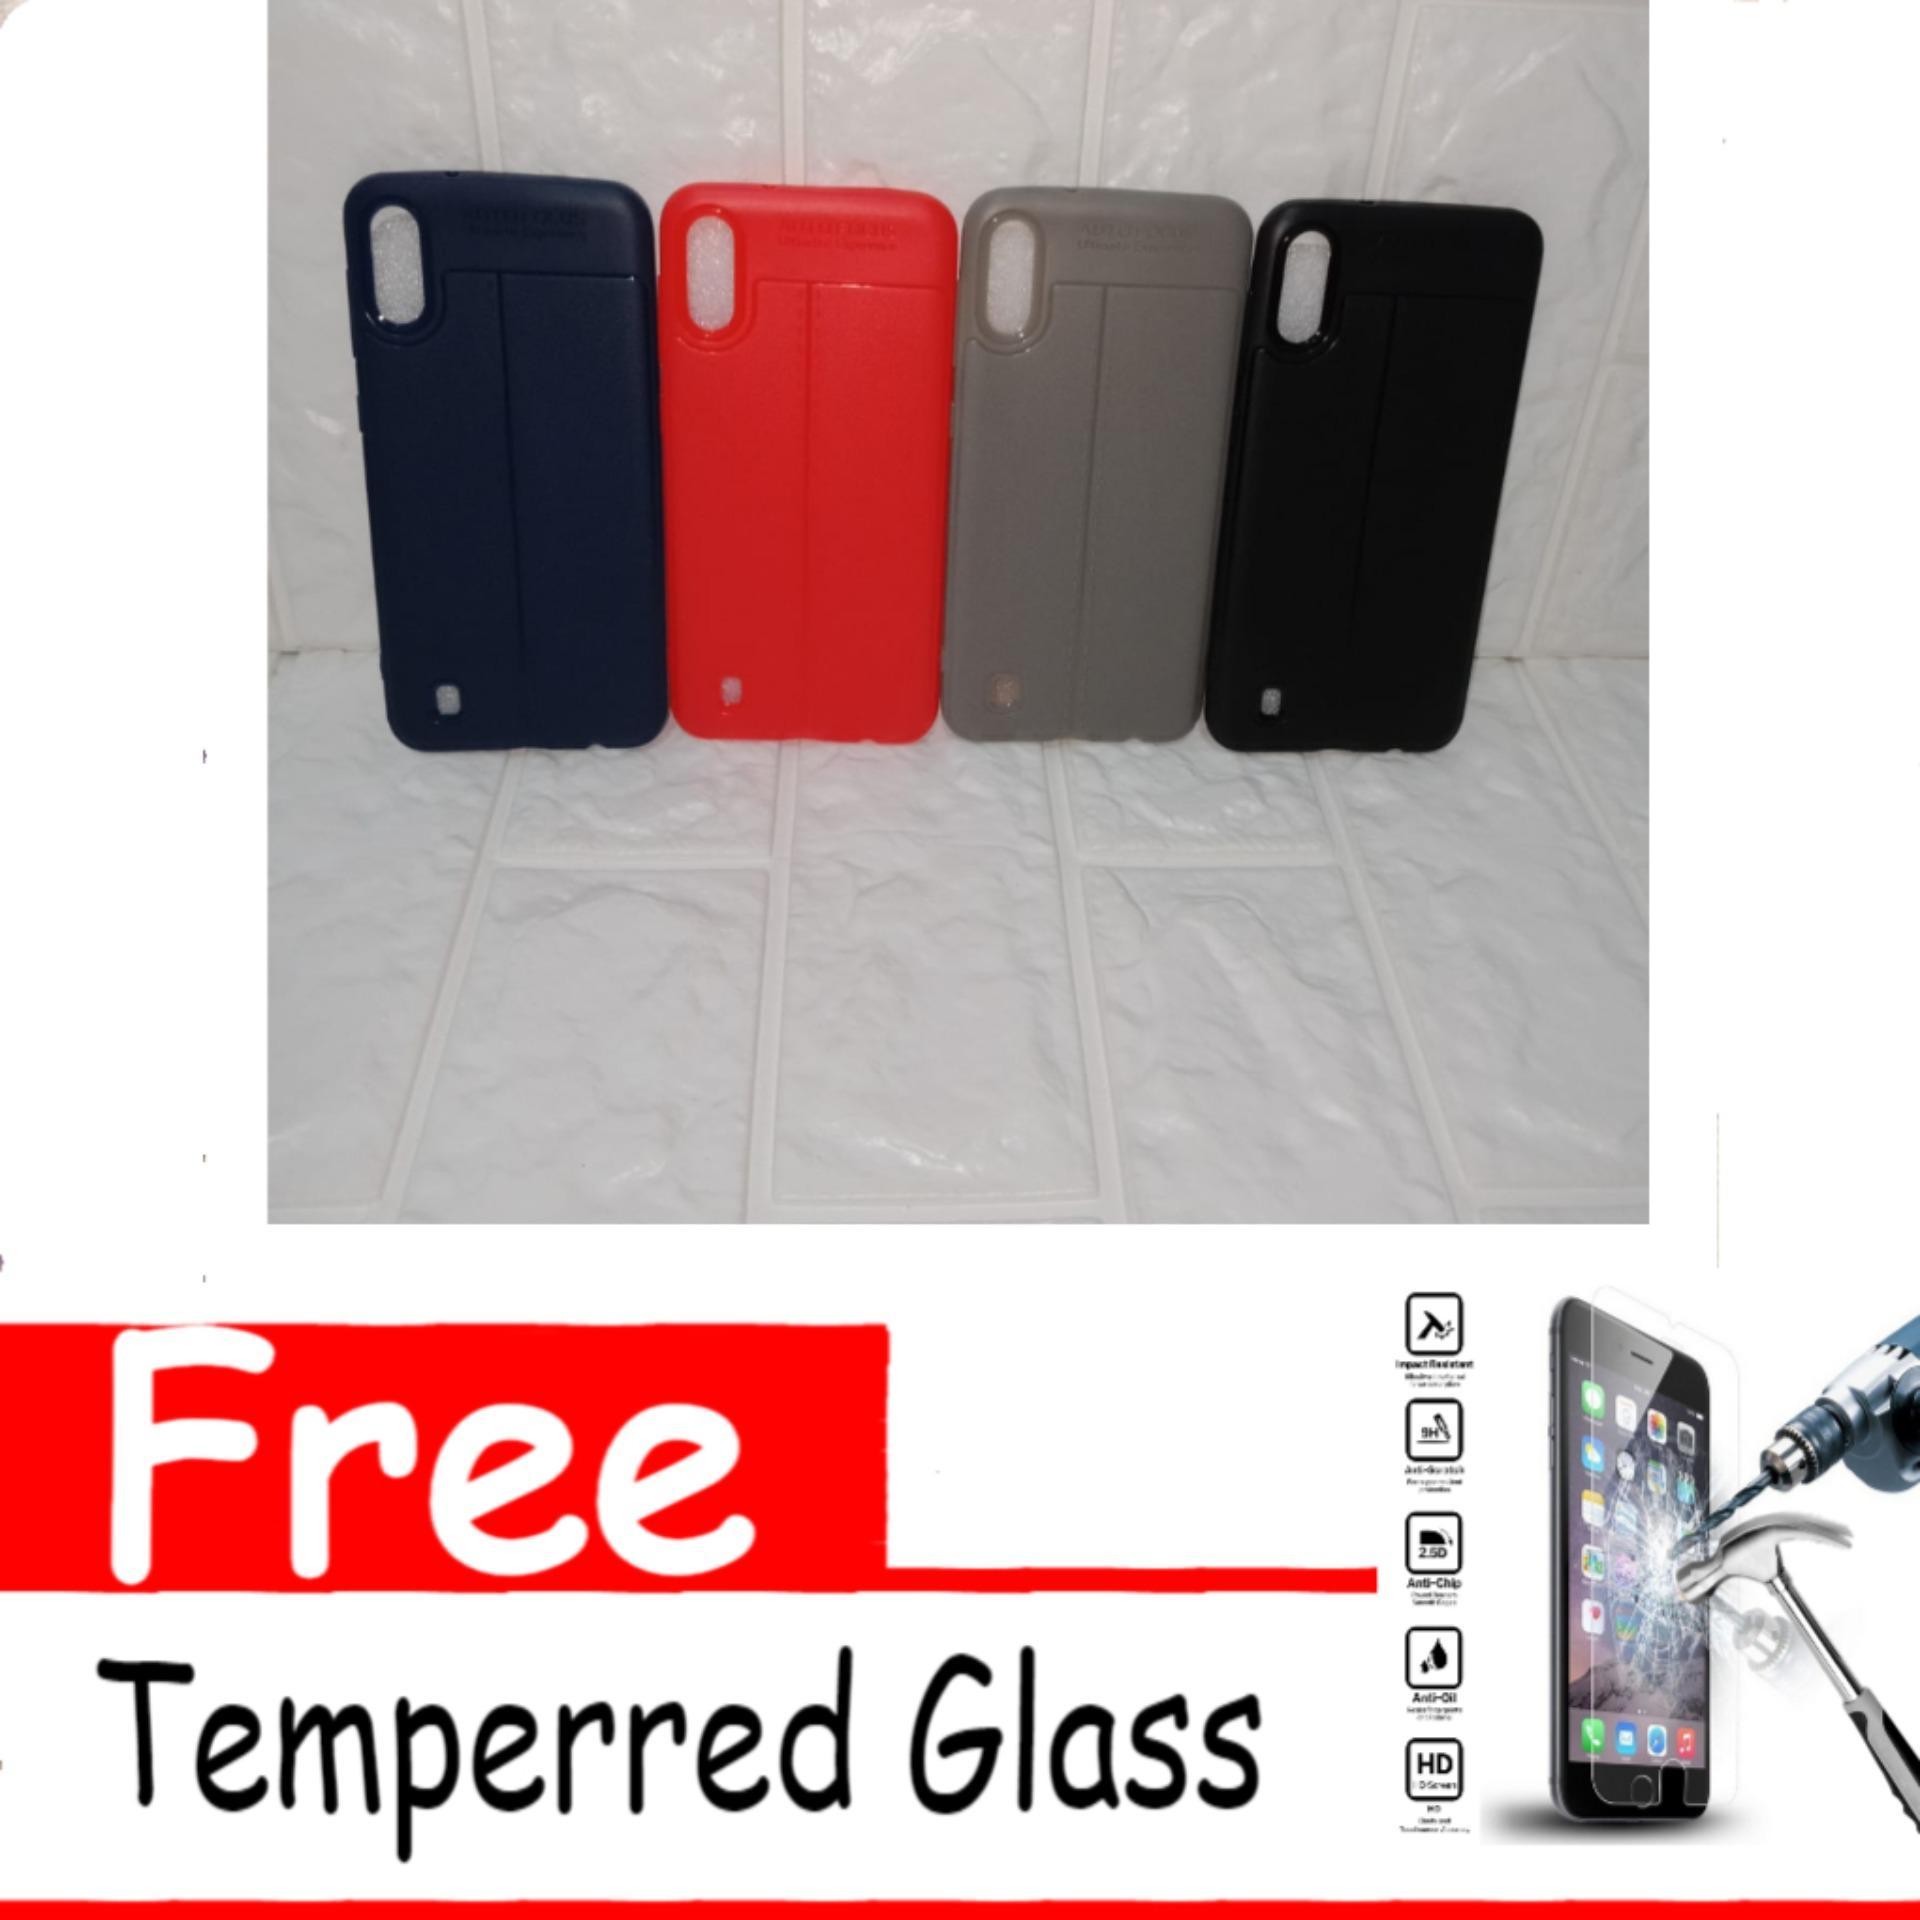 Casing Handphone Spigen Iron TransFormers Hardcase Casing For Samsung Galaxi J2 PrimeIDR19000. Rp 19.200